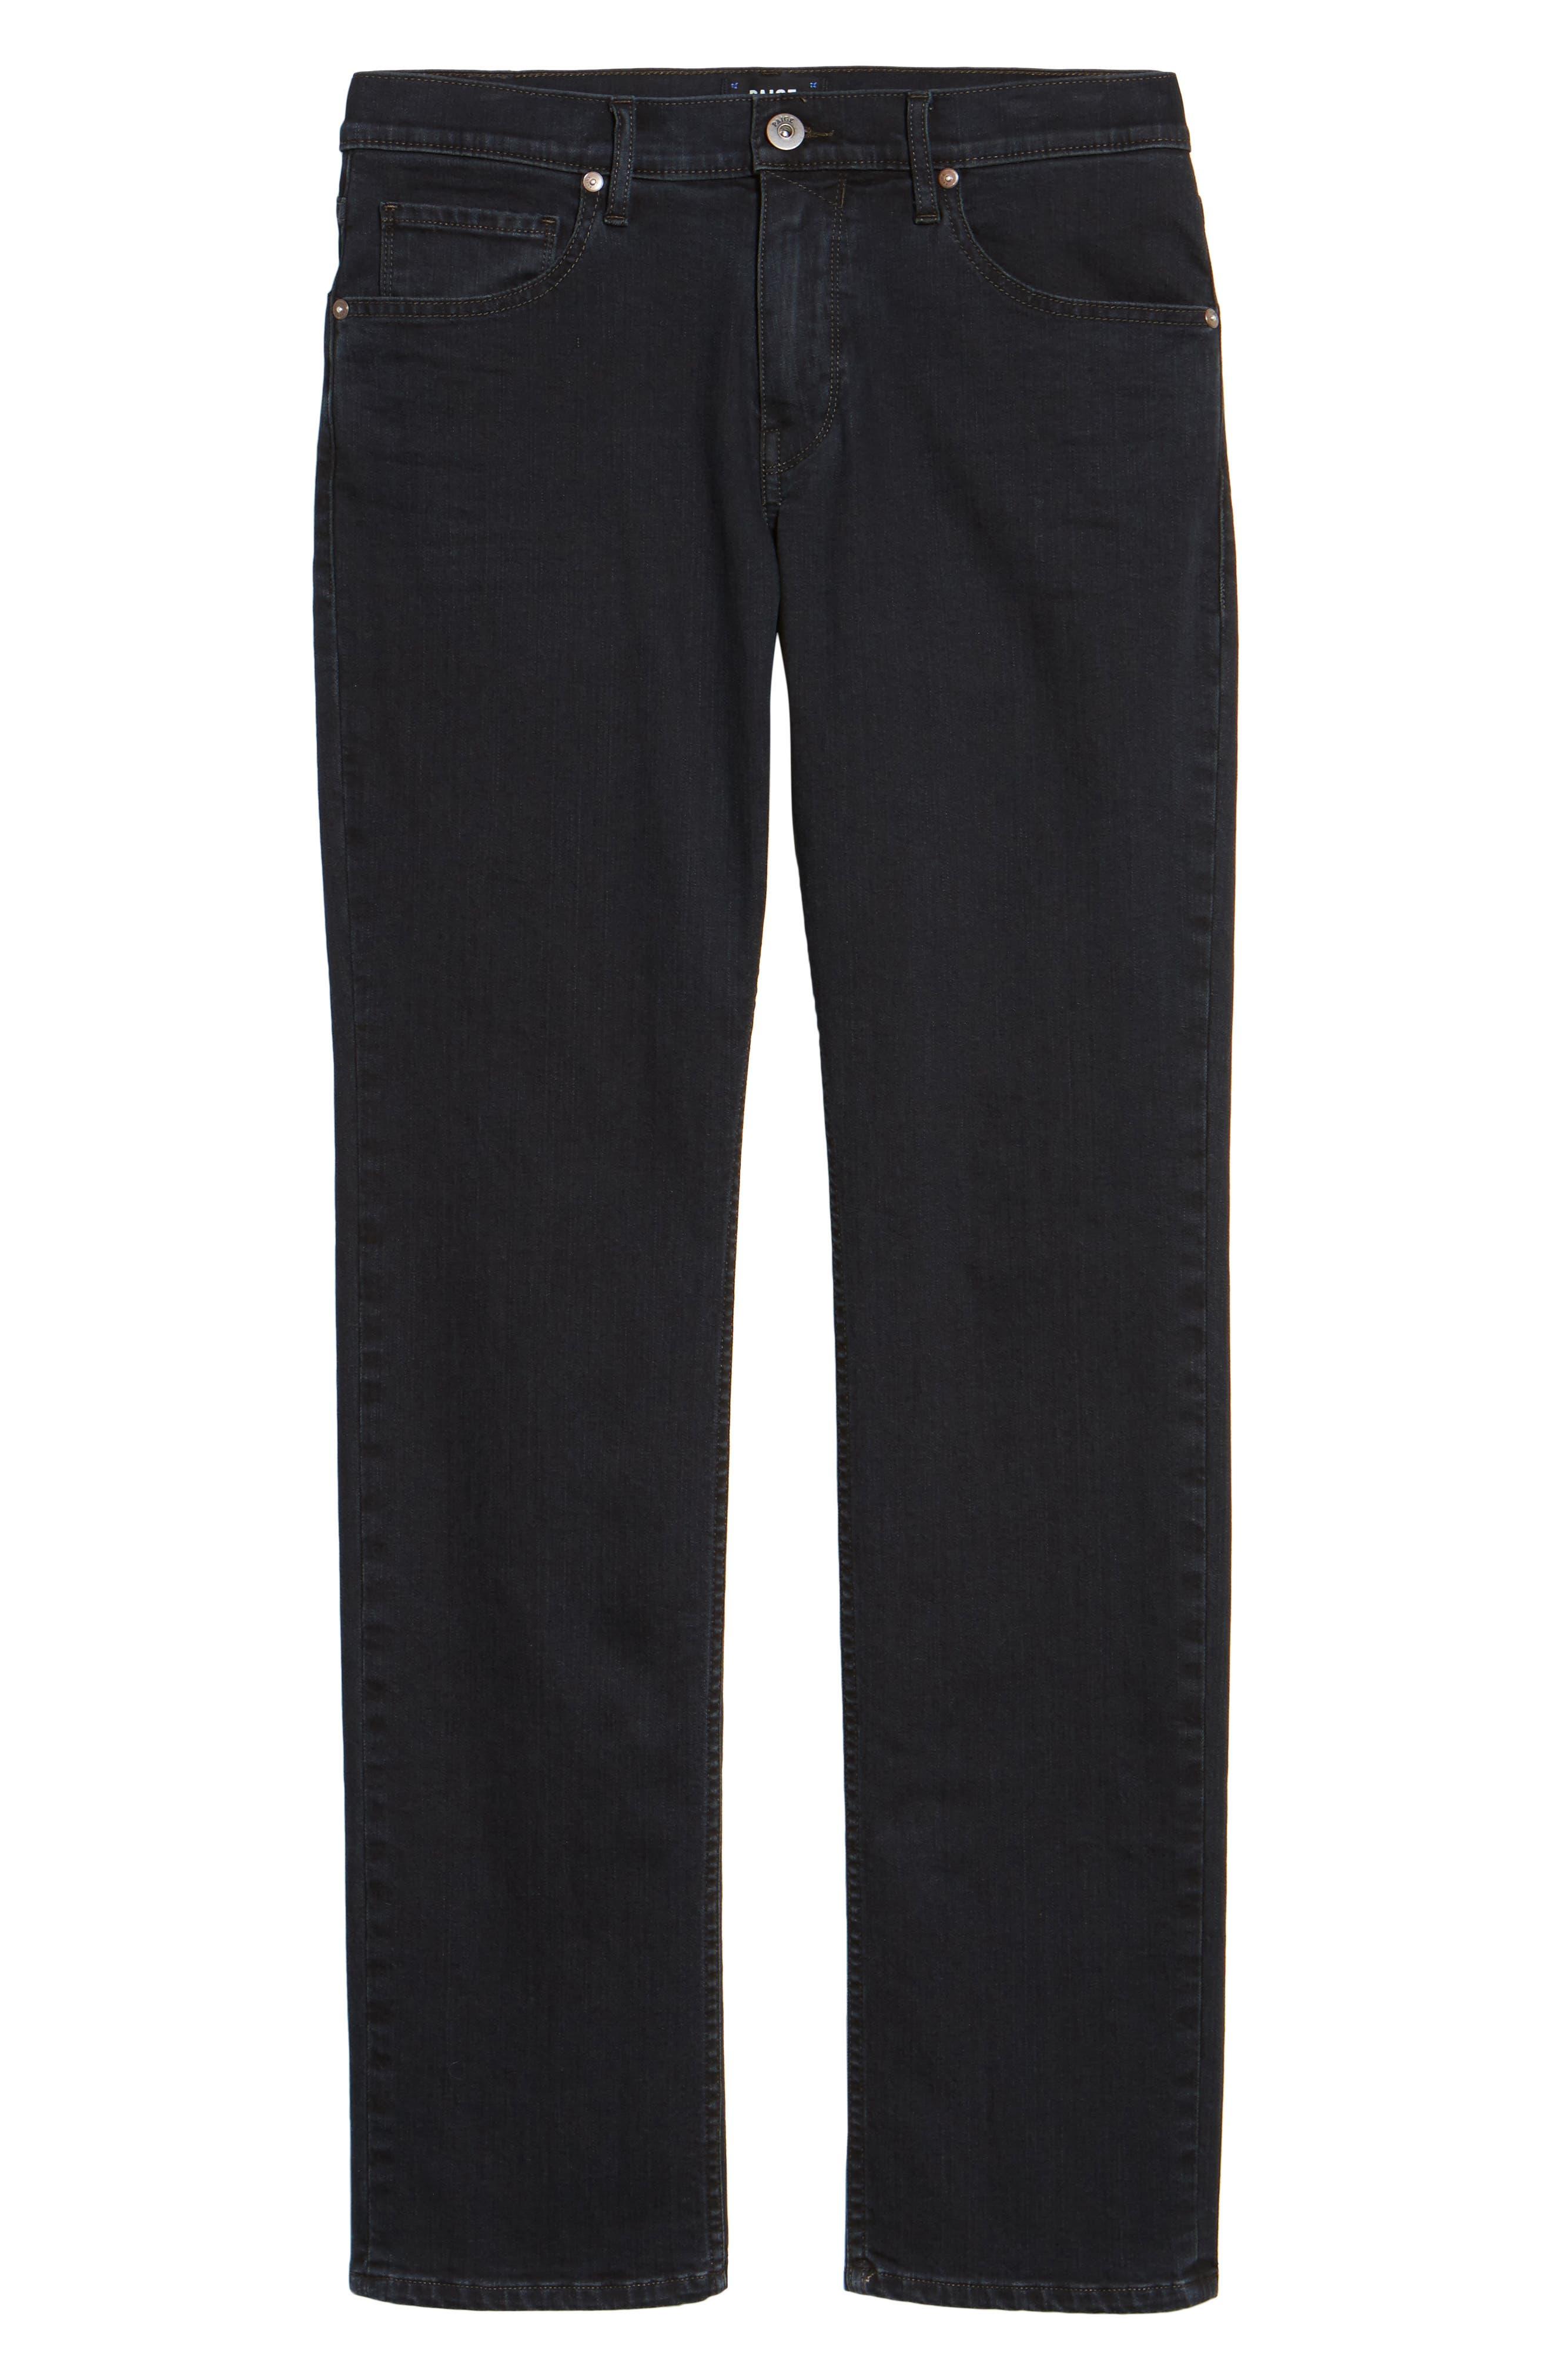 Normandie Straight Leg Jeans,                             Alternate thumbnail 6, color,